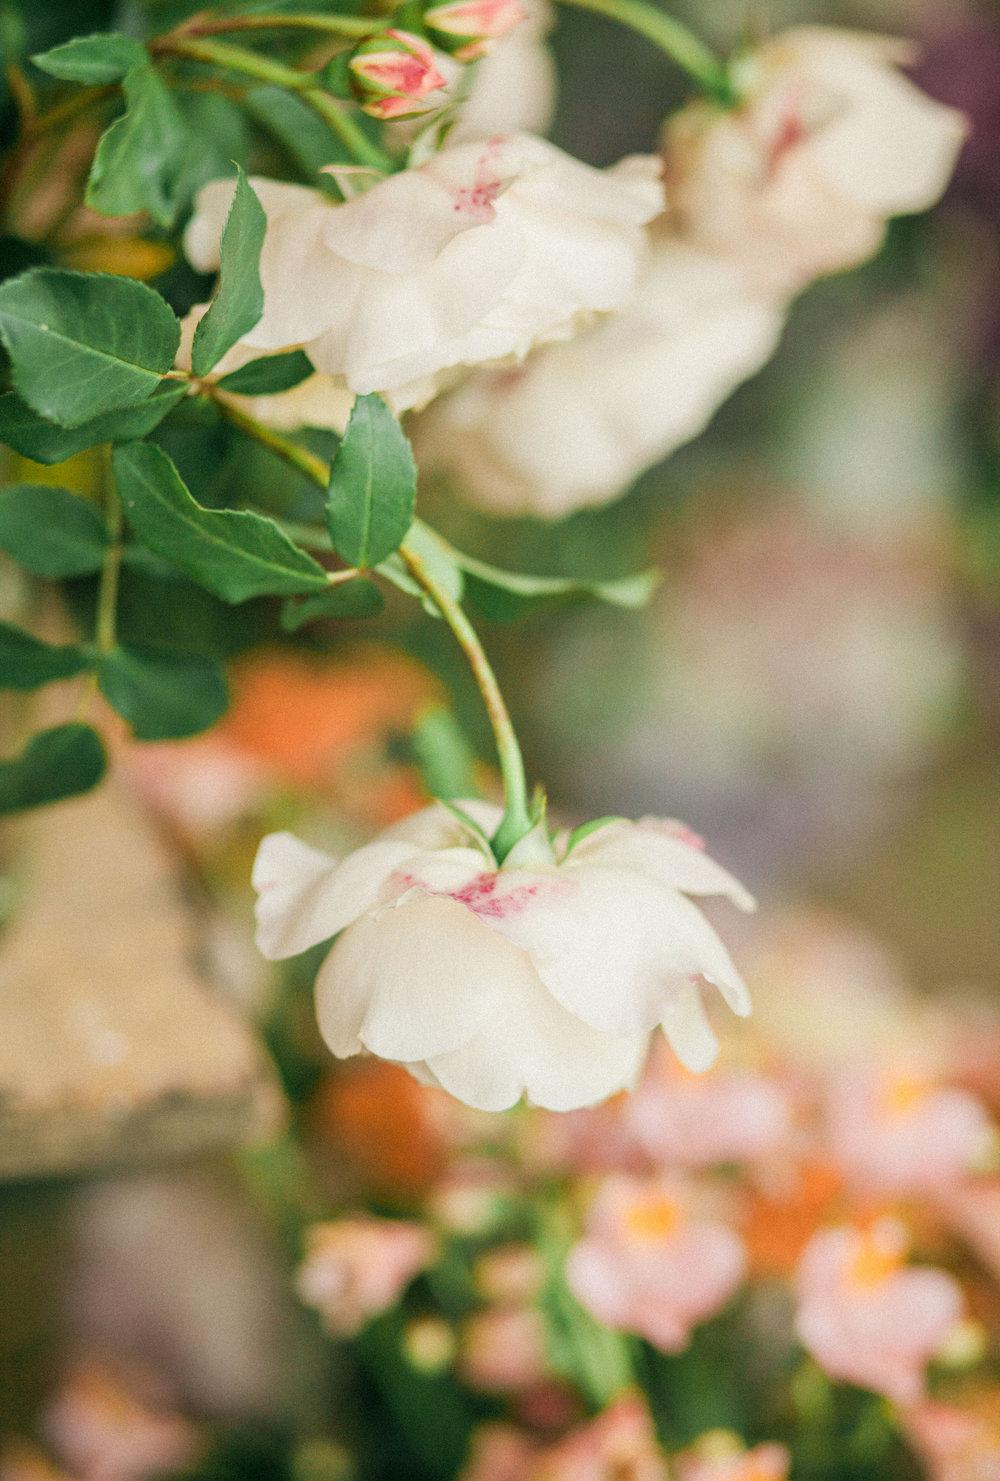 Image - Gina Dover Jaques | Florals - Moss & Stoen Floral Design